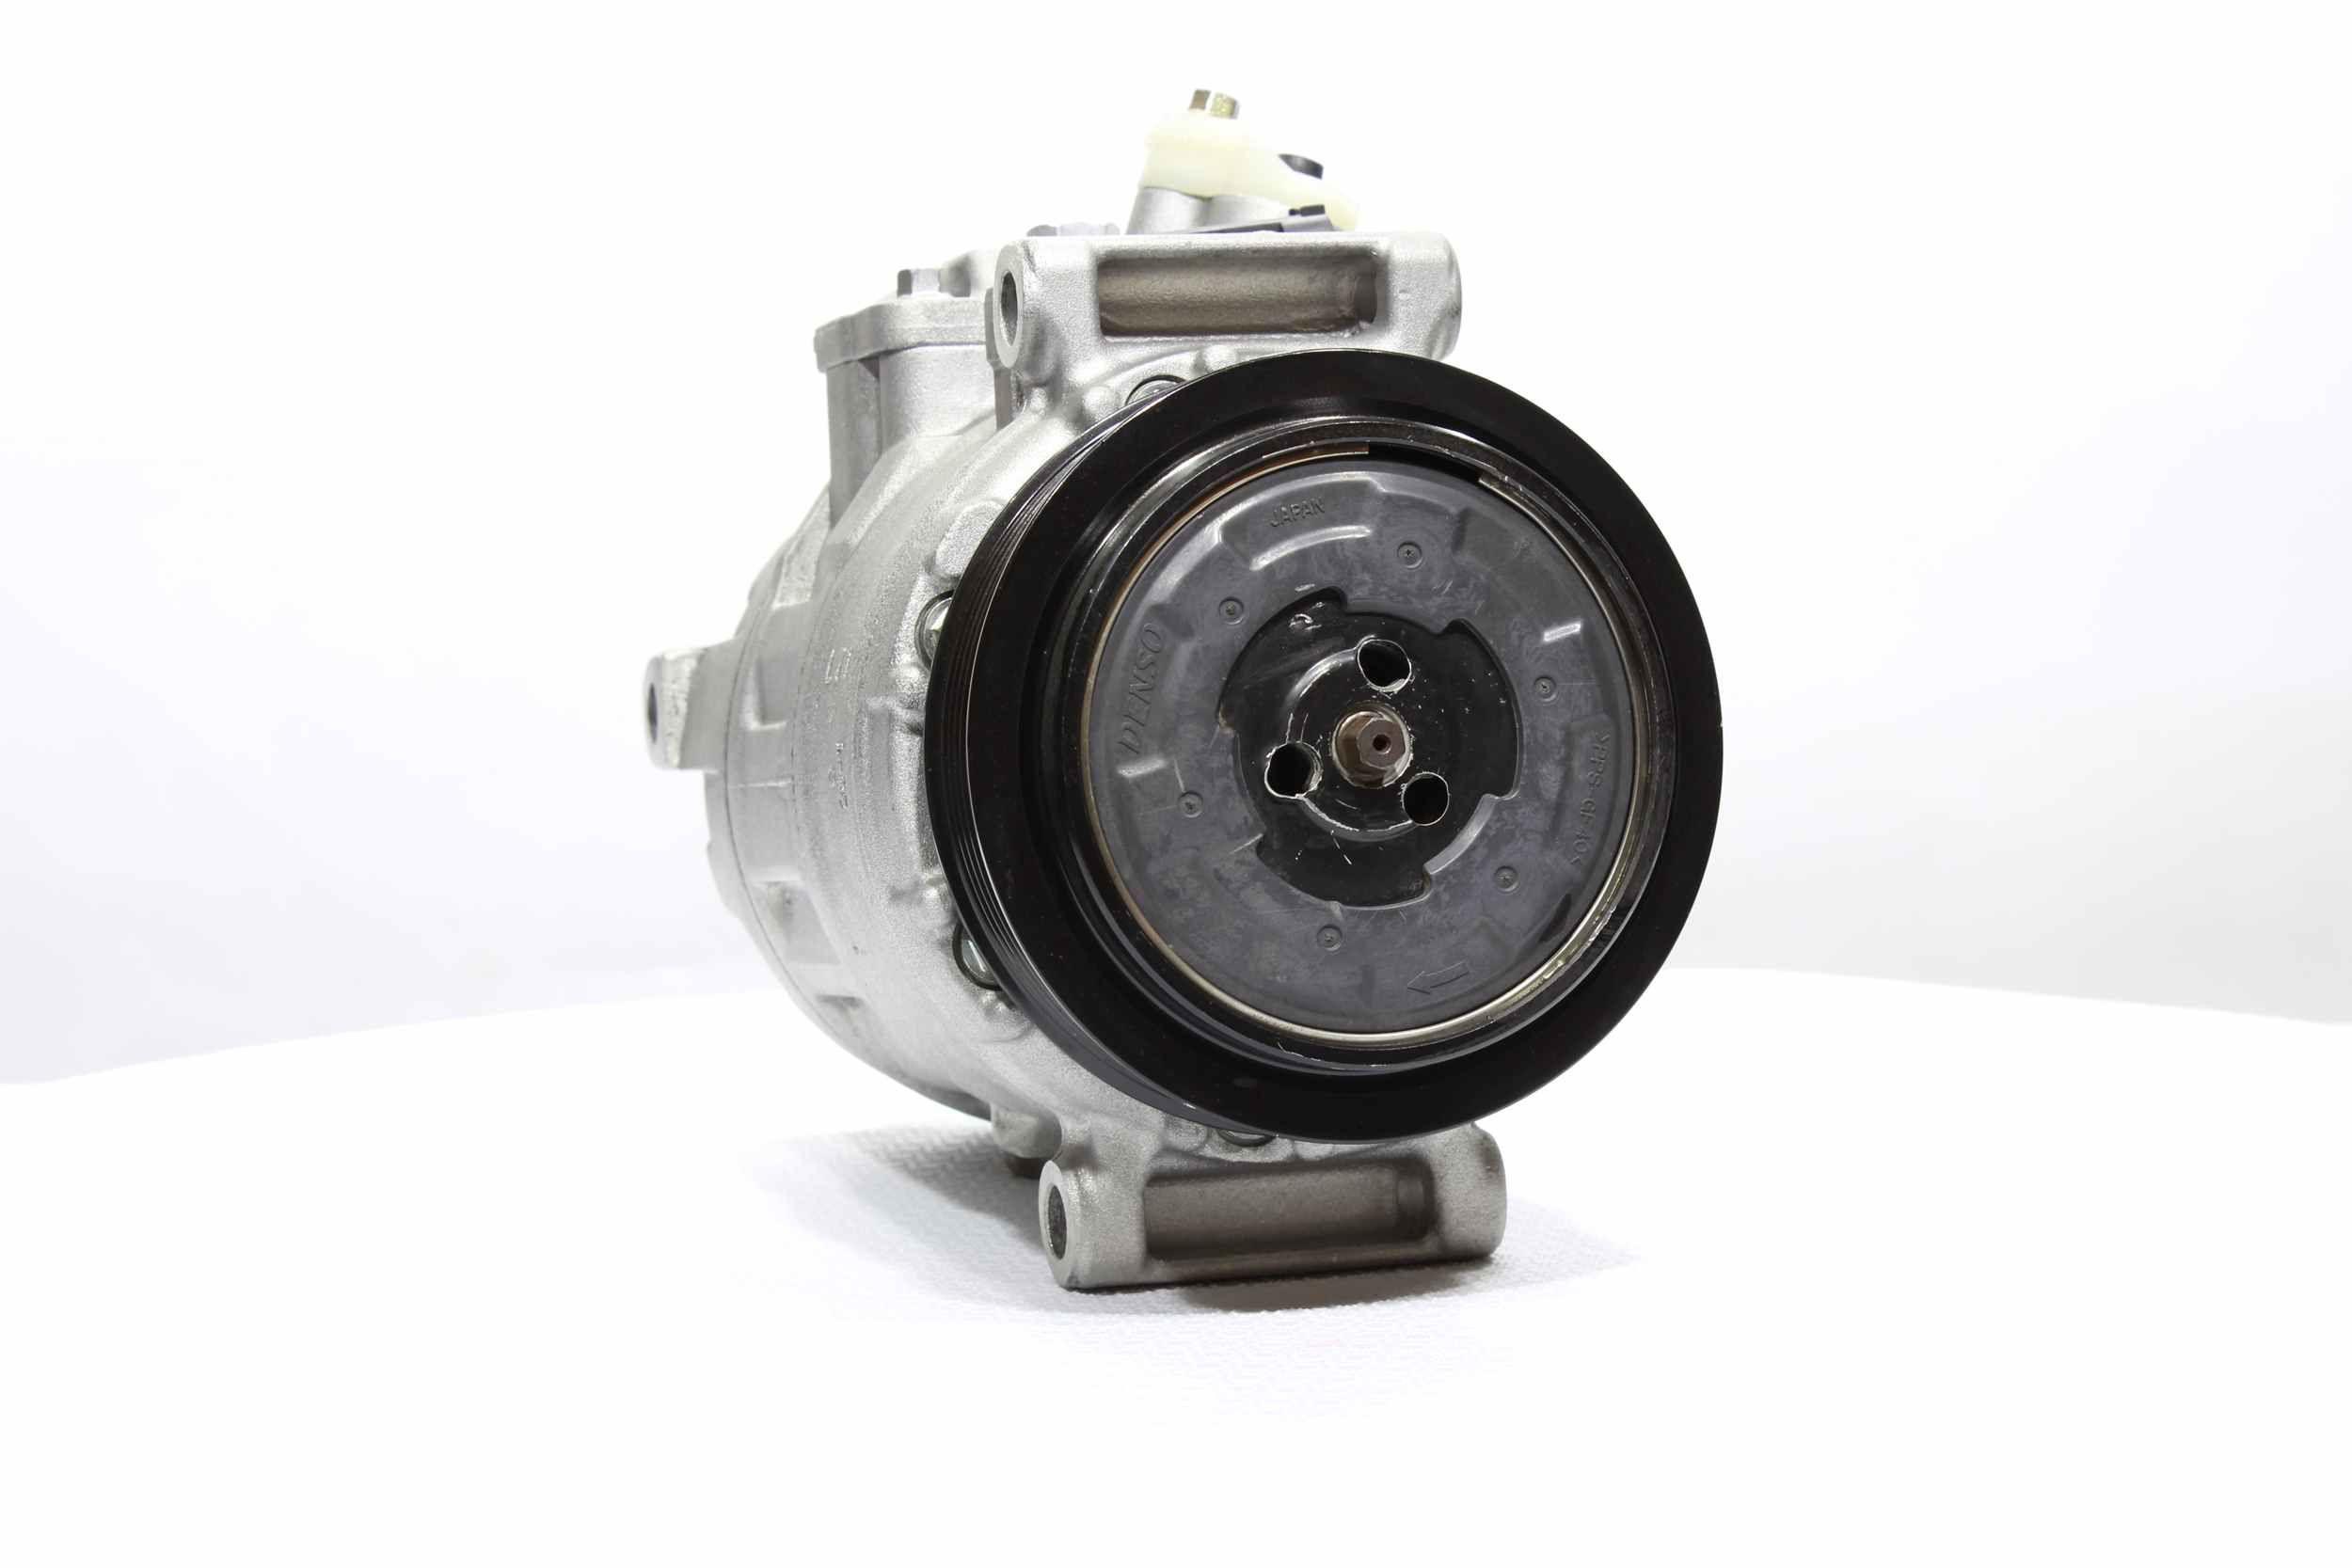 10550536 Klimaanlage Kompressor ALANKO - Markenprodukte billig